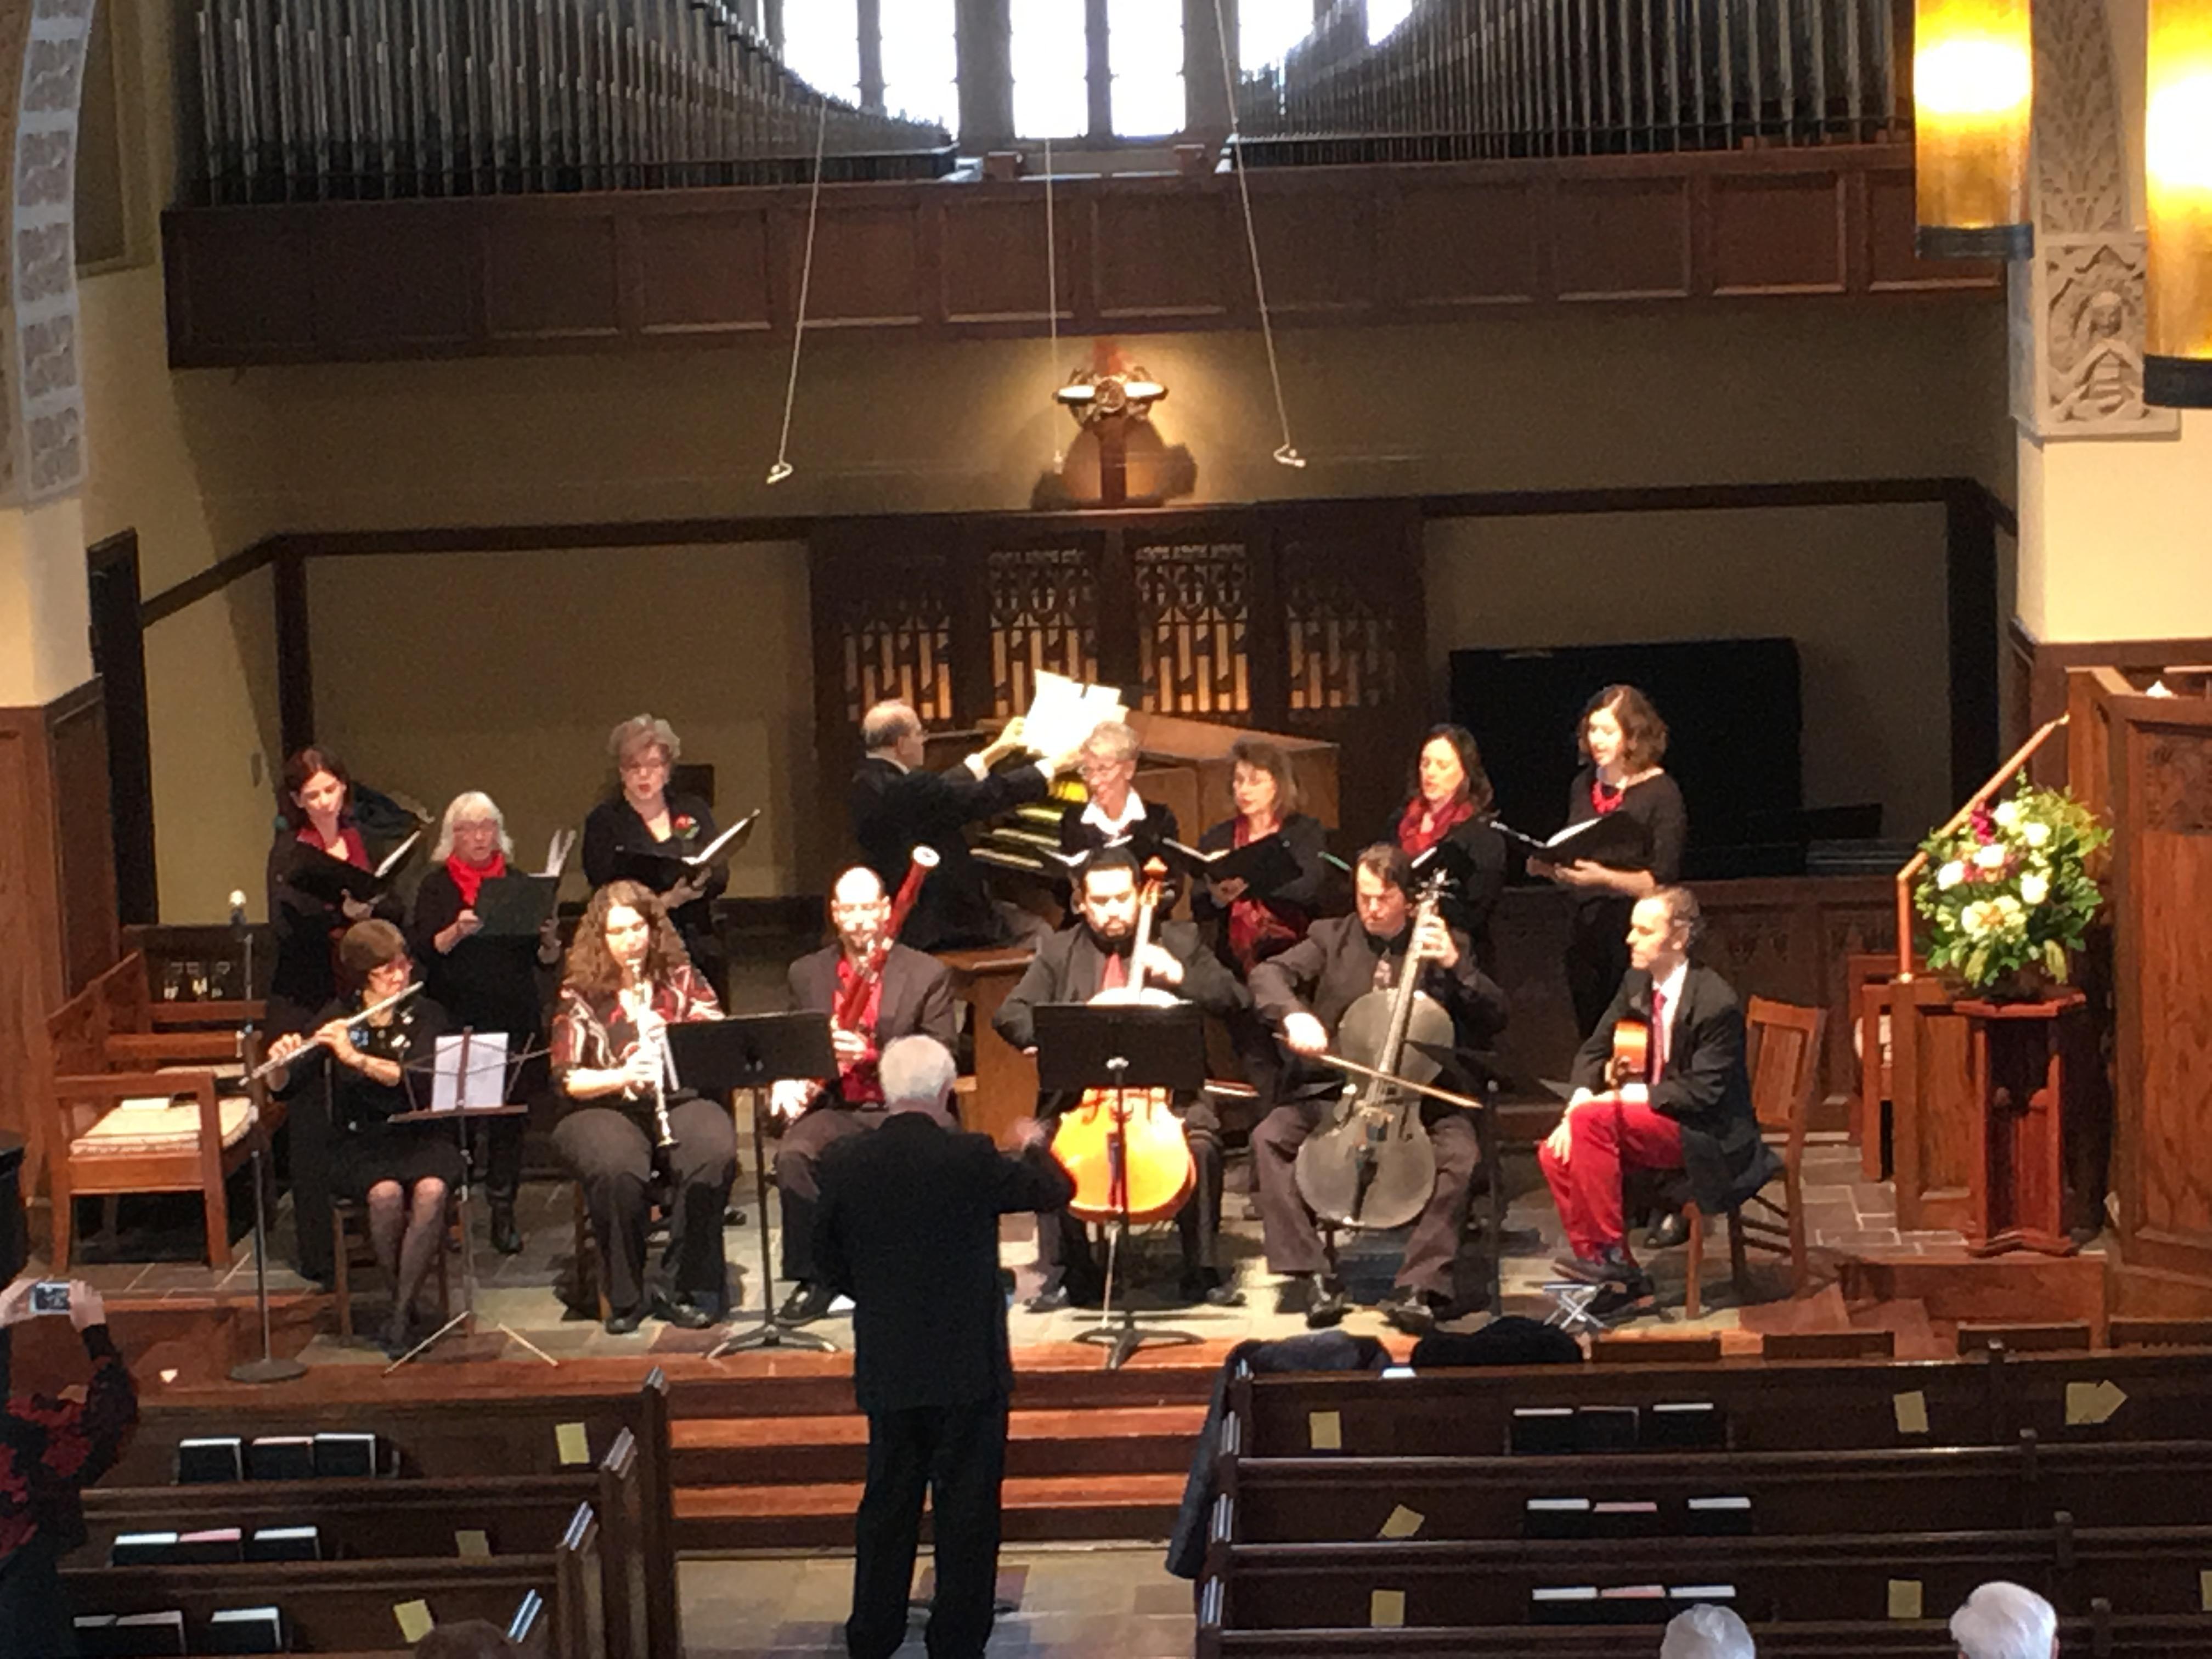 WSMC 95th Anniv Concert (2) 1-24-16 IMG_0548 - Copy